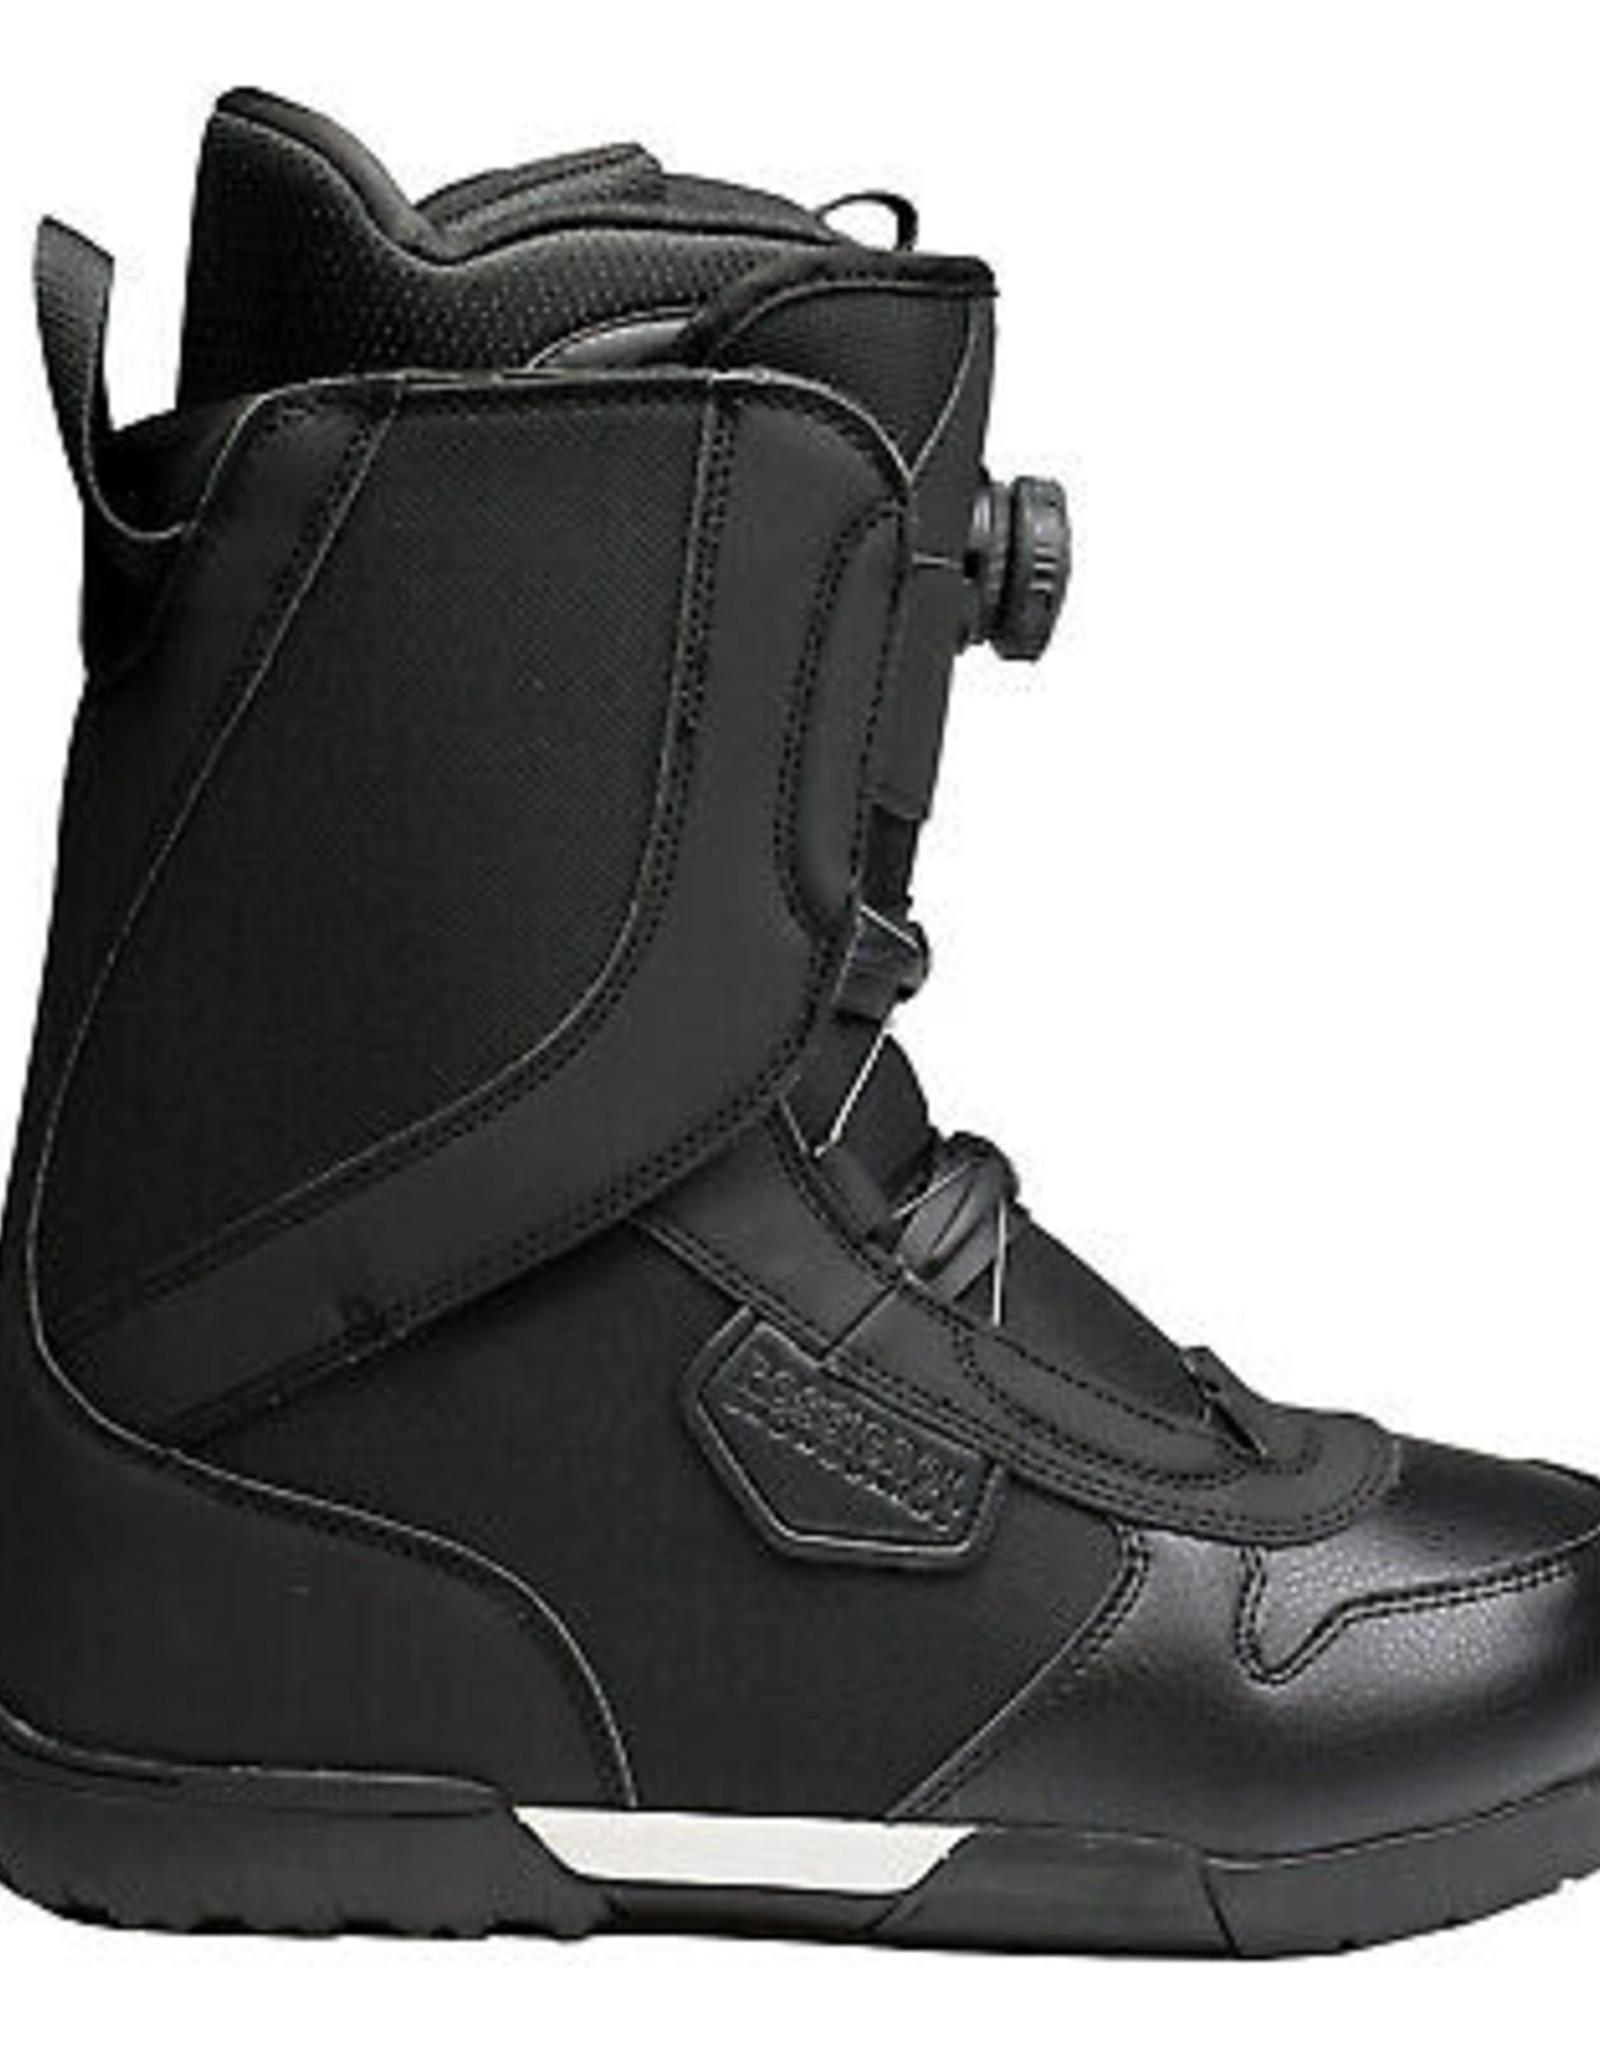 ROSSIGNOL Rossignol Crank BOA H3 Boot 10